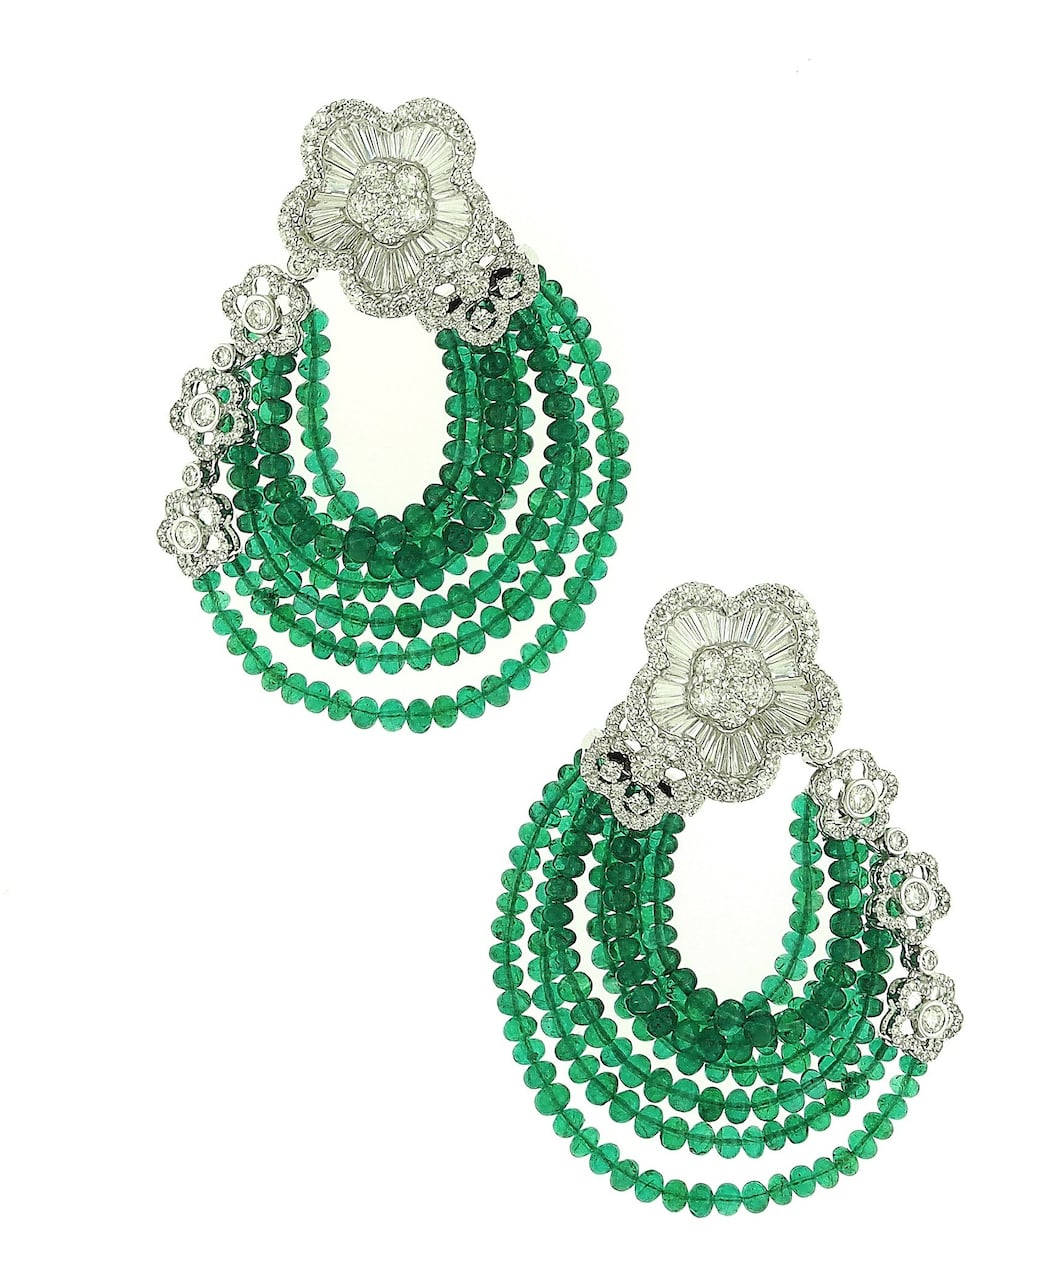 Schreiner-SFJ-Earrings-